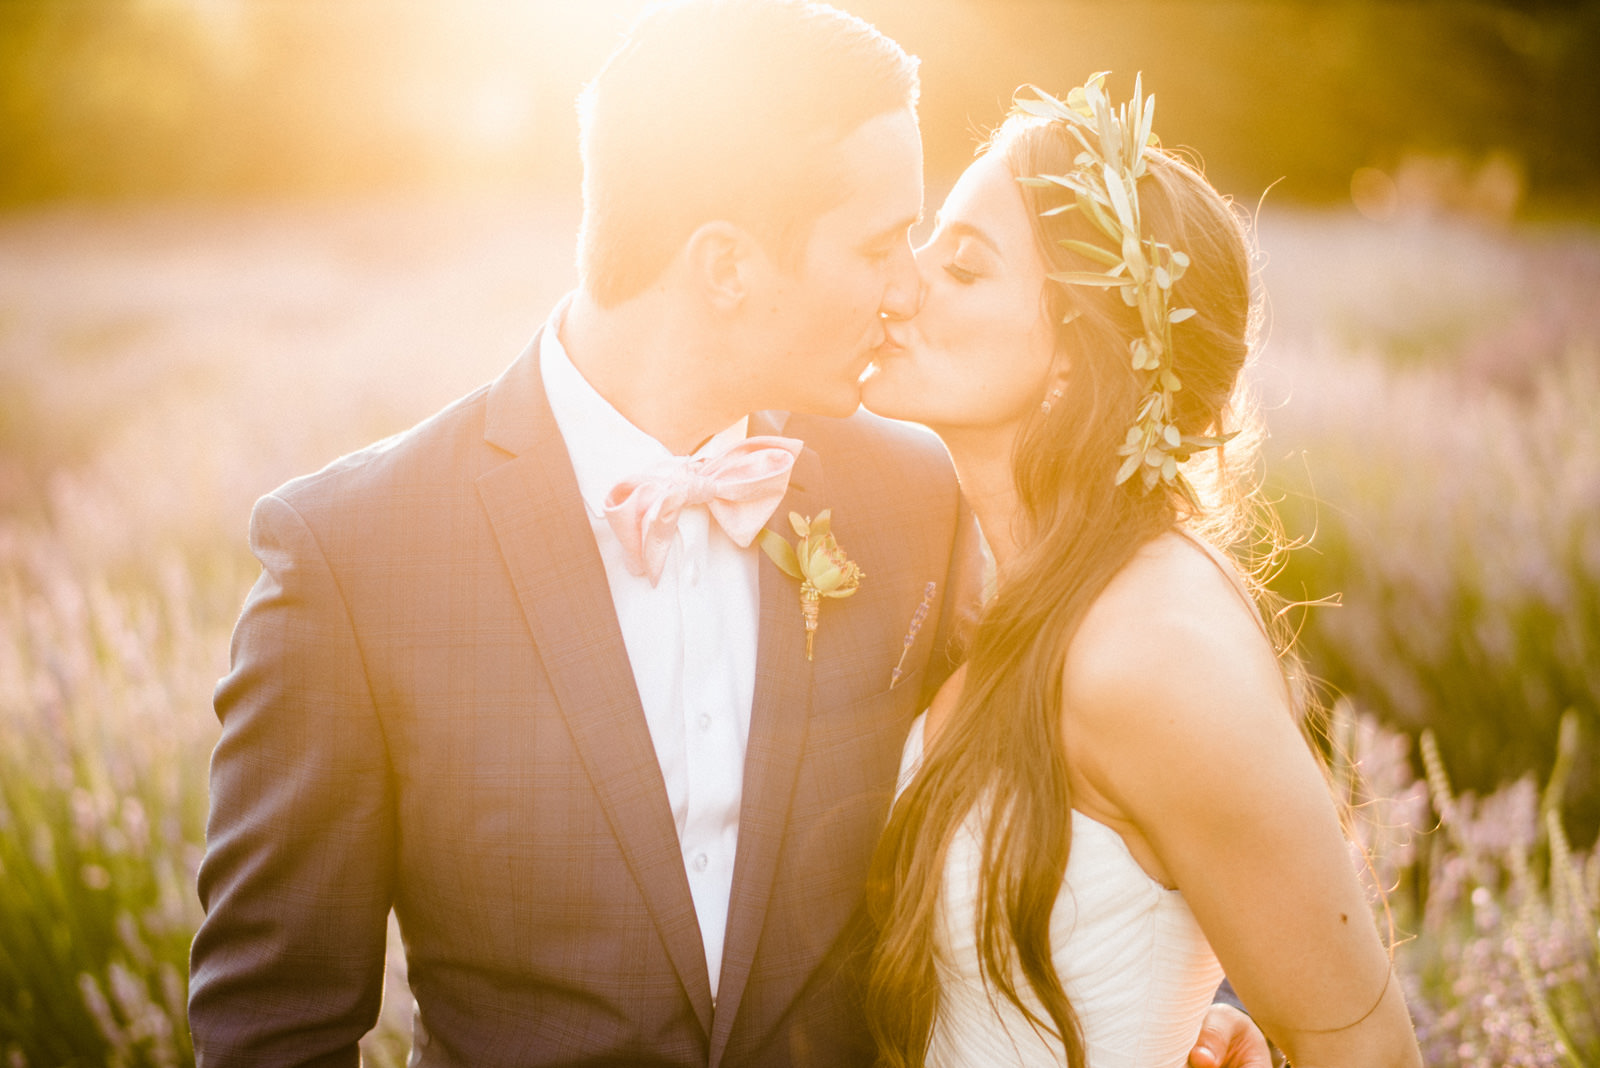 098-woodinville-lavendar-farm-wedding-with-golden-glowy-photos.jpg